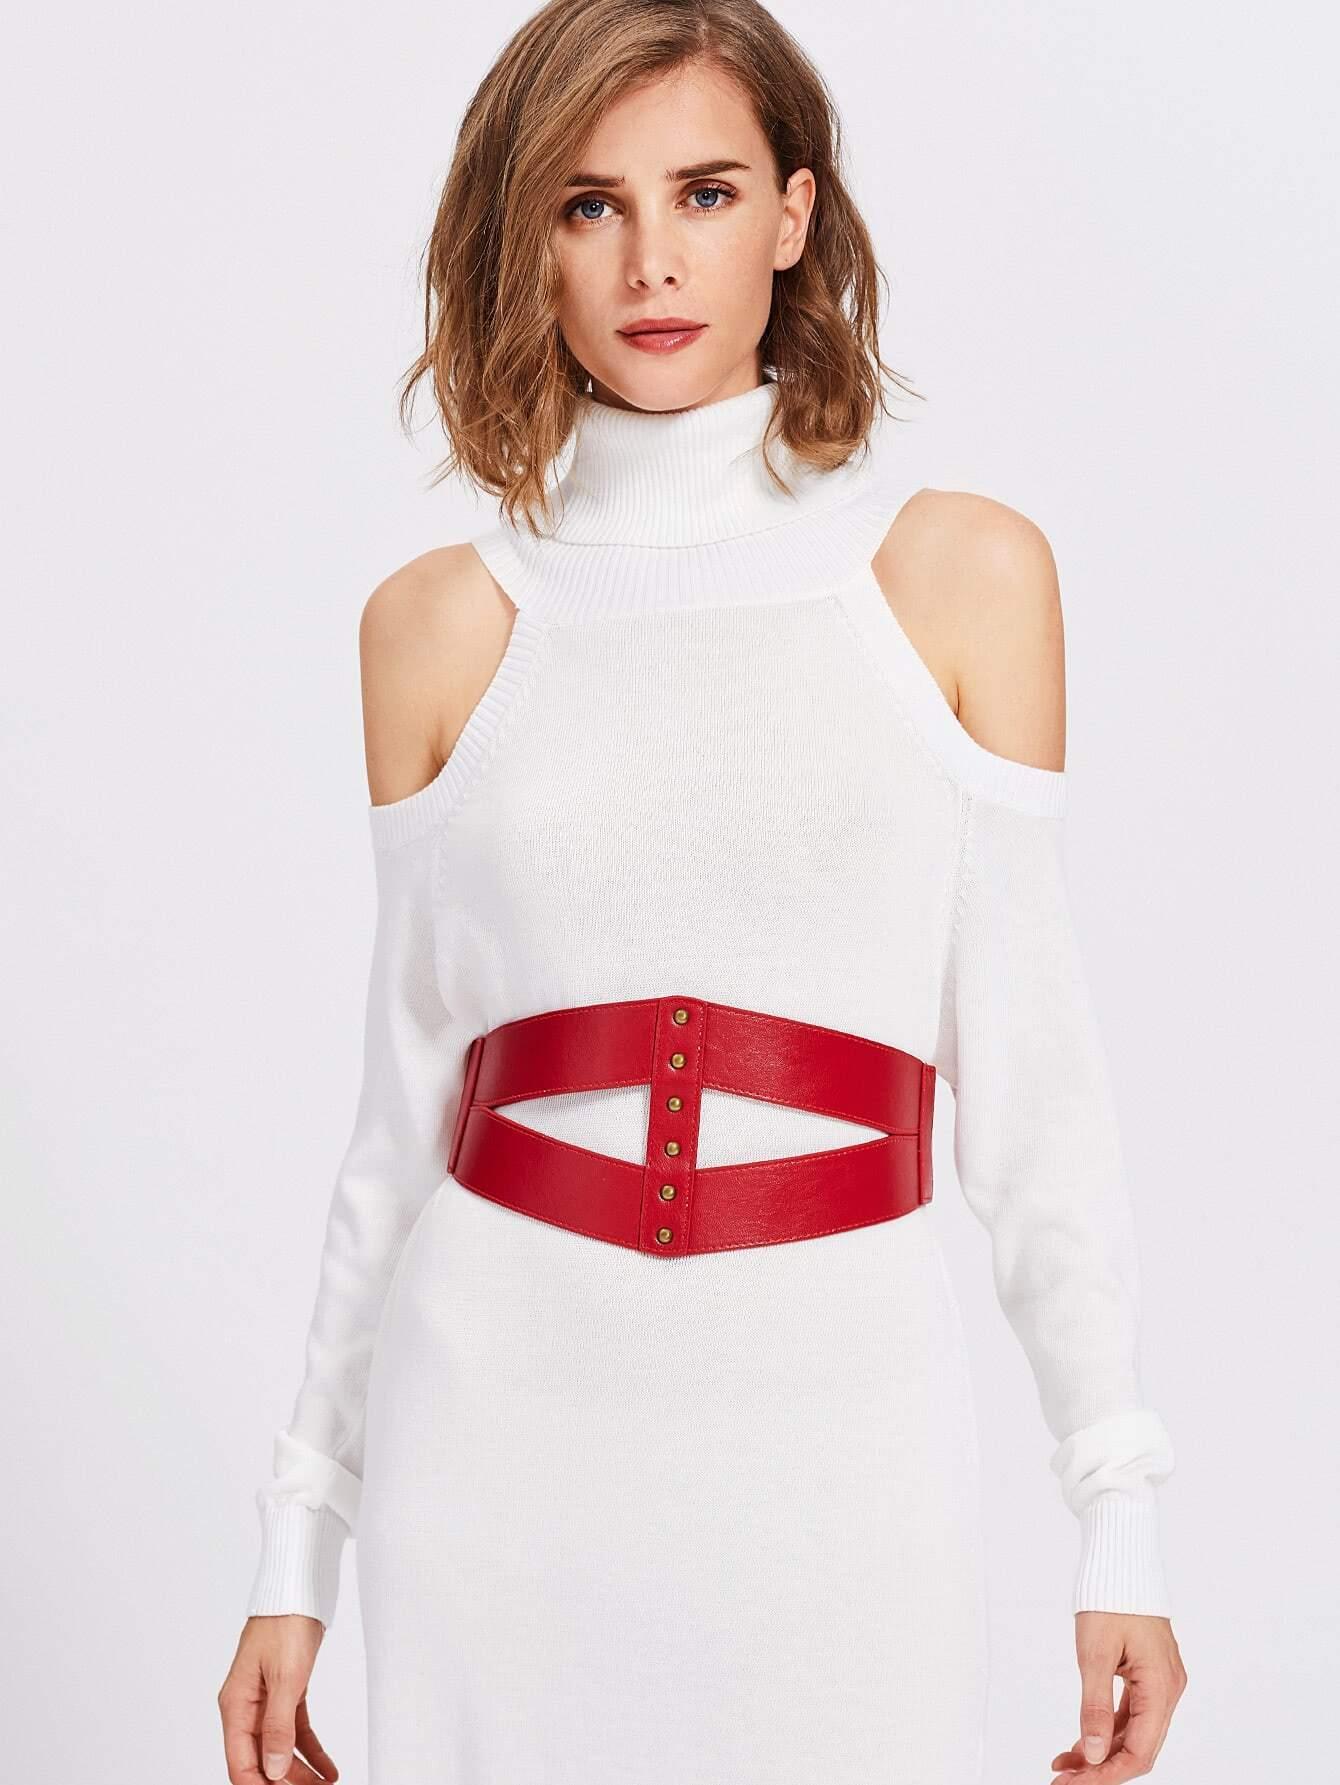 Triangle Cut Elastic Waist Belt